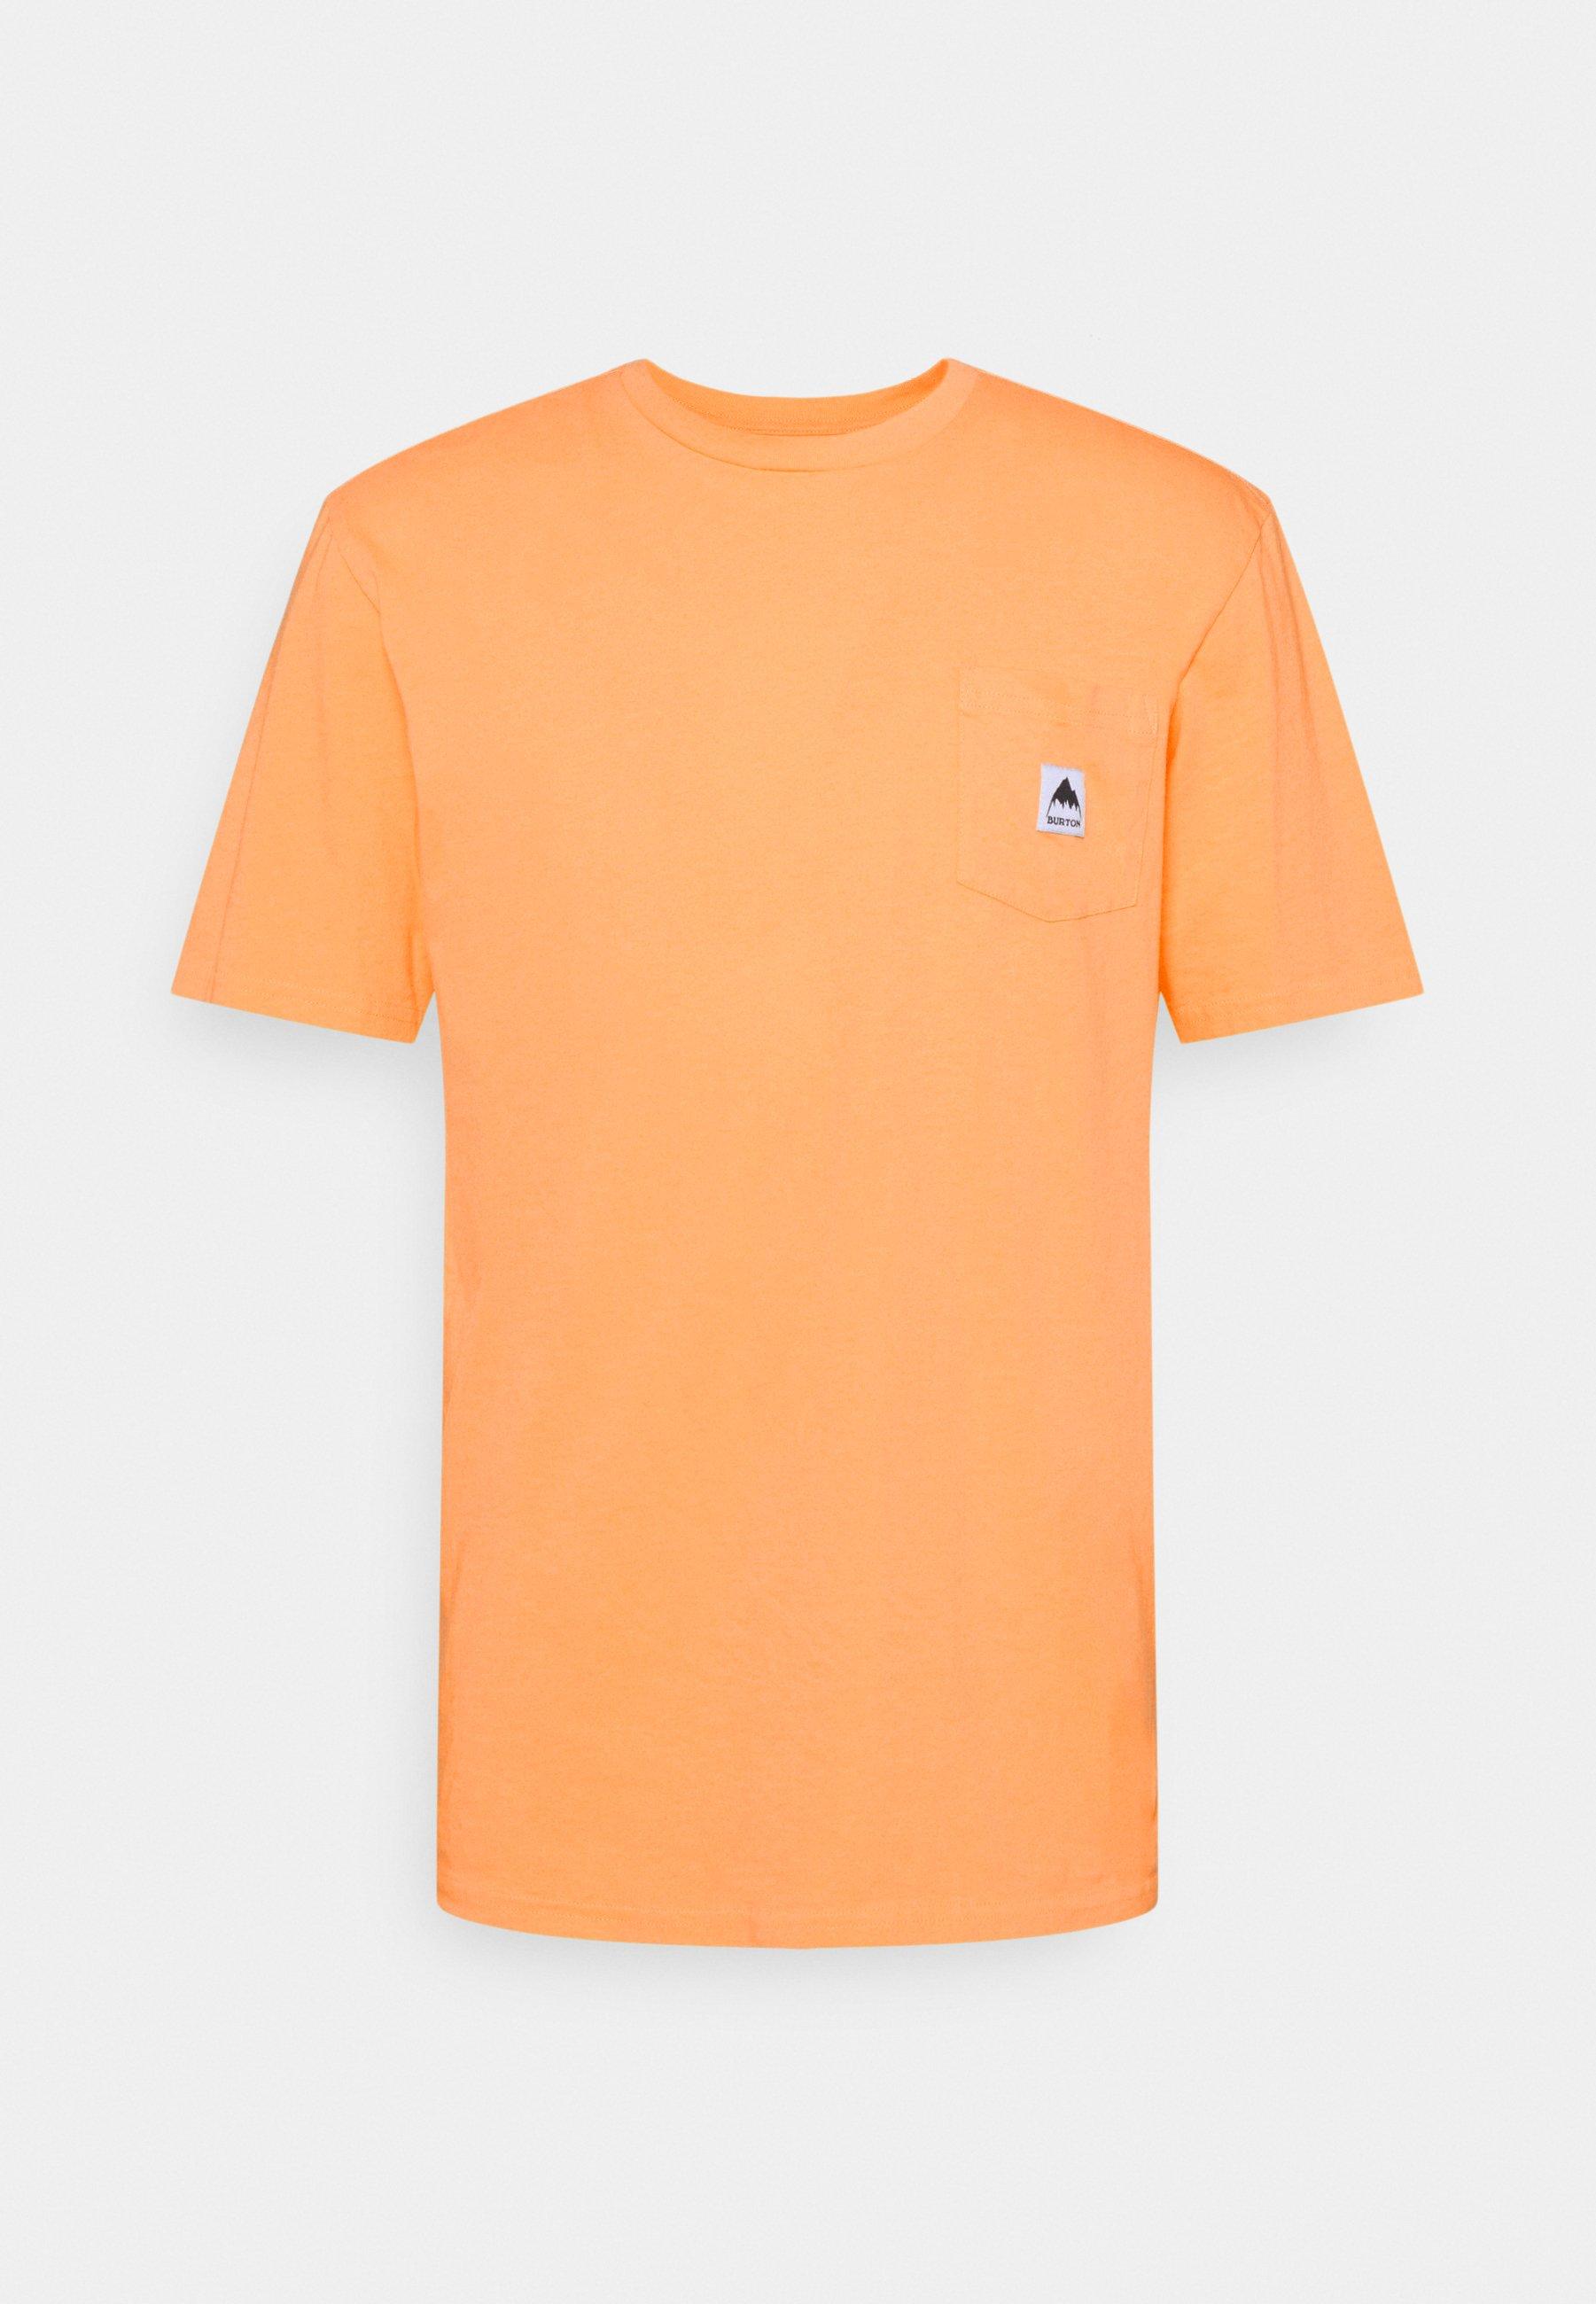 Homme COLFAX PAPAYA - T-shirt basique